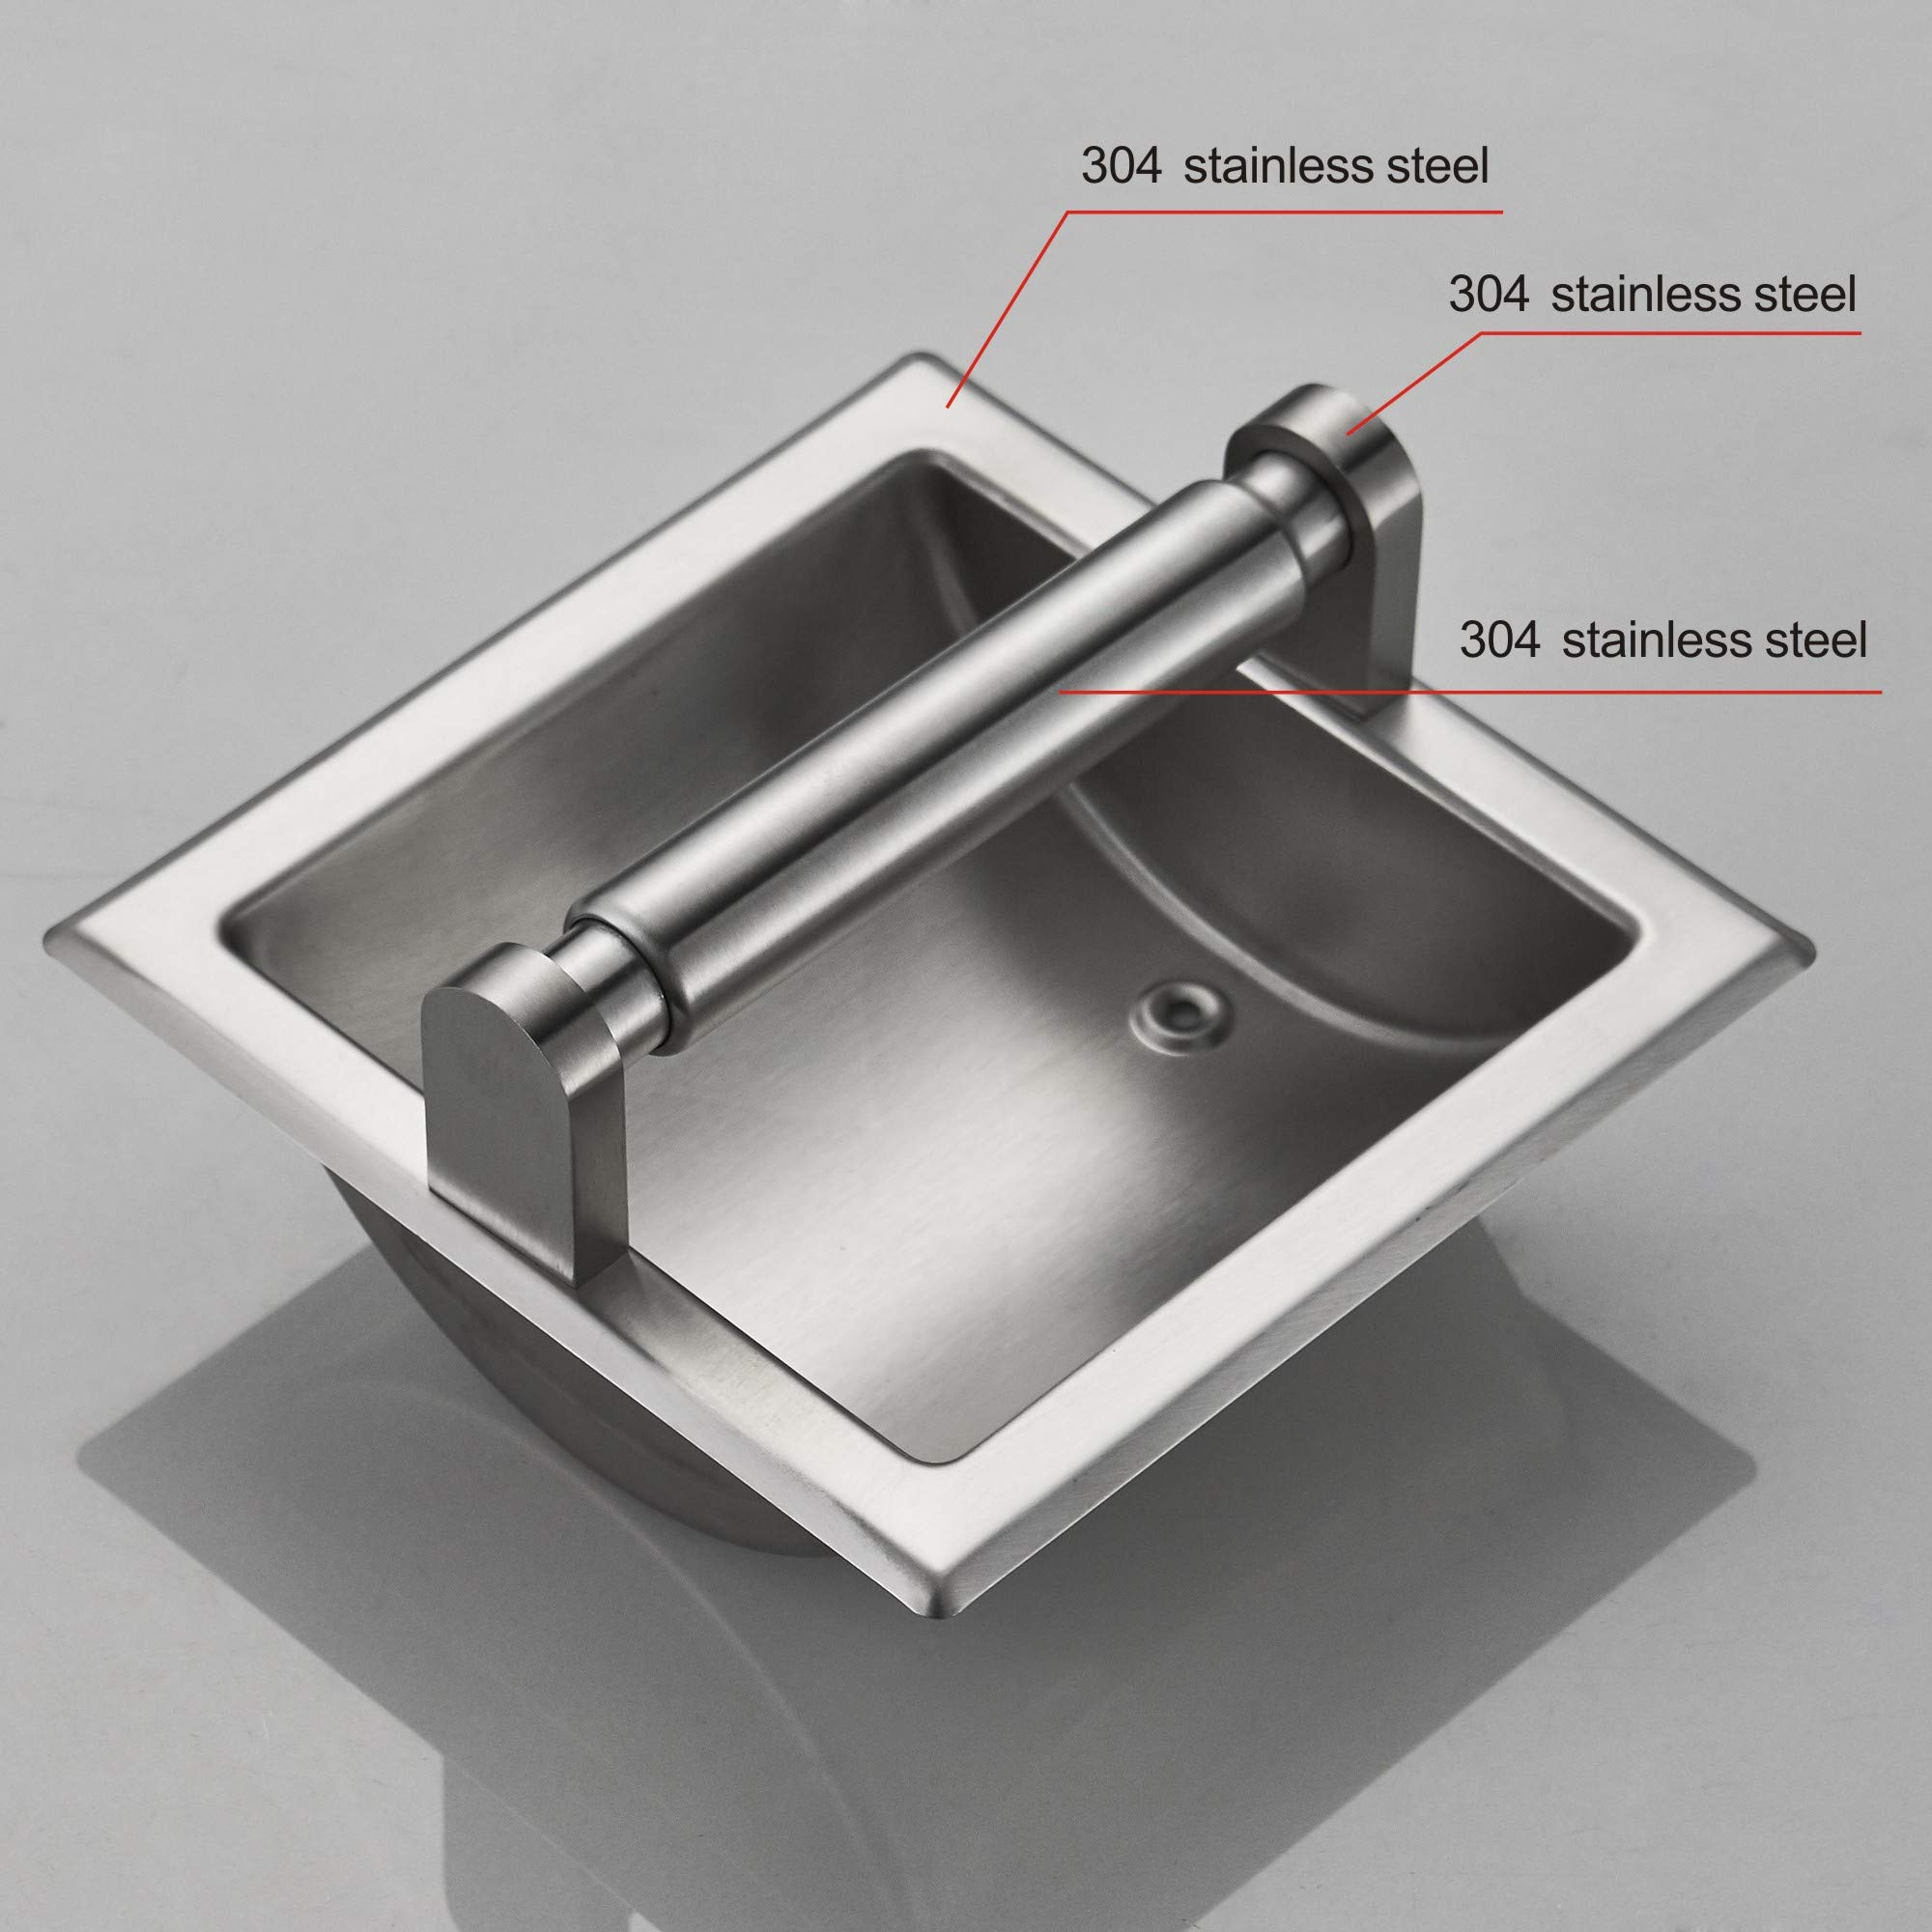 JunSun Brushed Nickel Recessed Toilet Paper Holder Wall Toilet Paper Holder Recessed Toilet Tissue Holder Stainless Steel Toilet Paper Holder Rear Mounting Bracket Included by JunSun (Image #2)